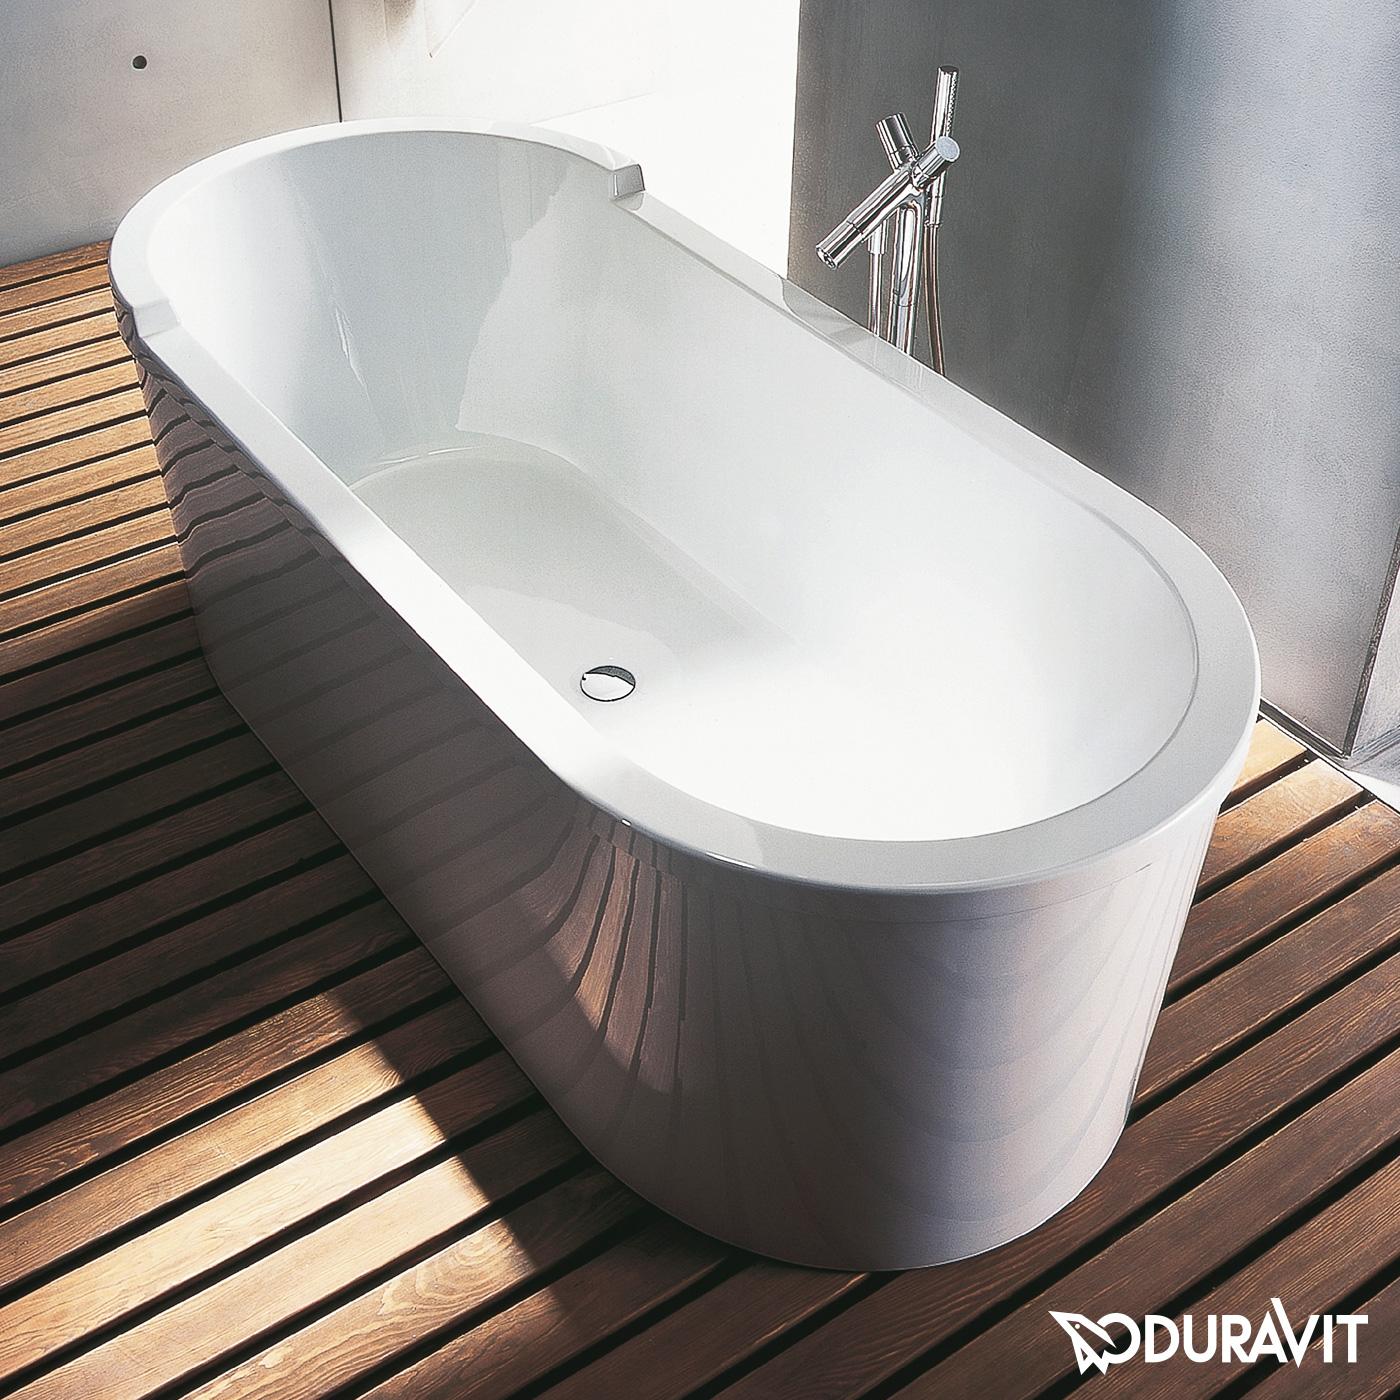 duravit starck oval badewanne freistehend 700010000000000 reuter onlineshop. Black Bedroom Furniture Sets. Home Design Ideas